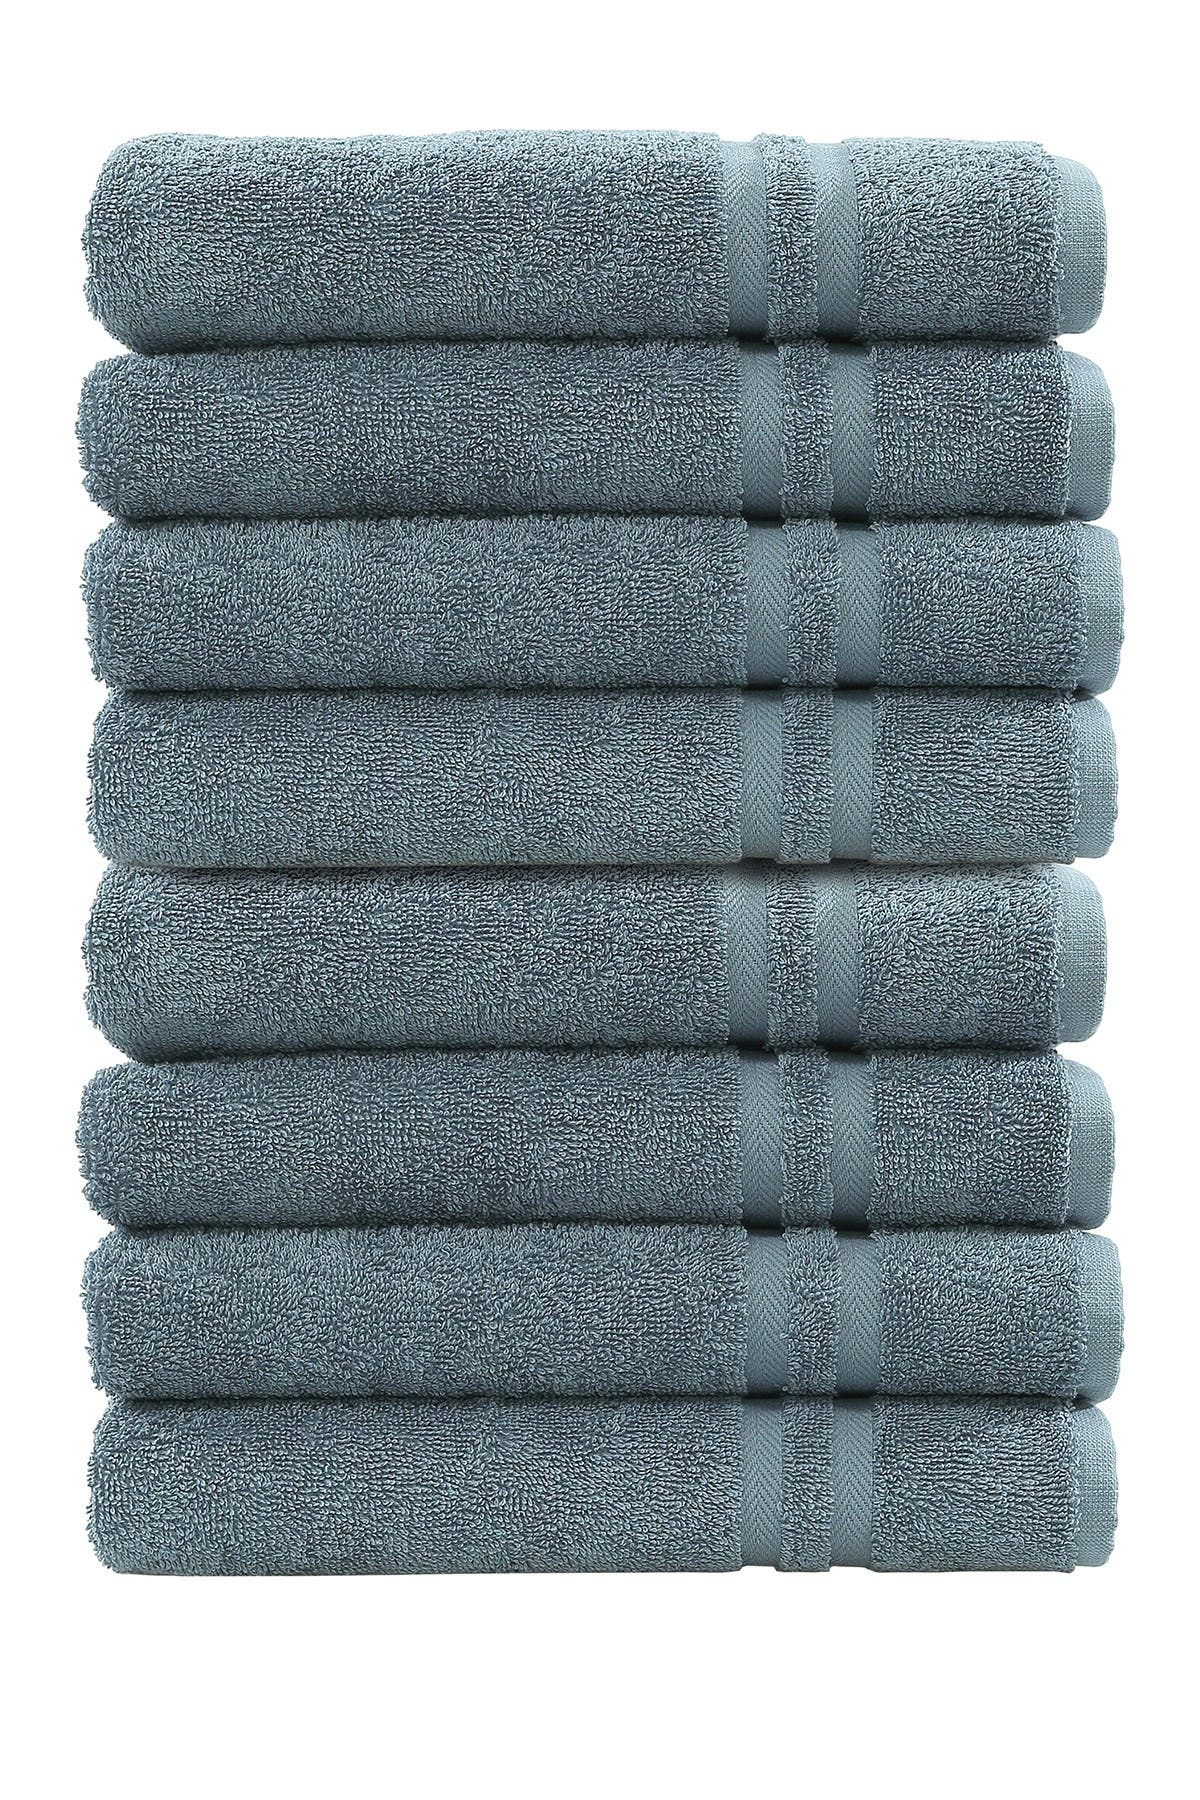 Image of LINUM HOME Denzi Hand Towels - Set of 8 - Denzi Blue